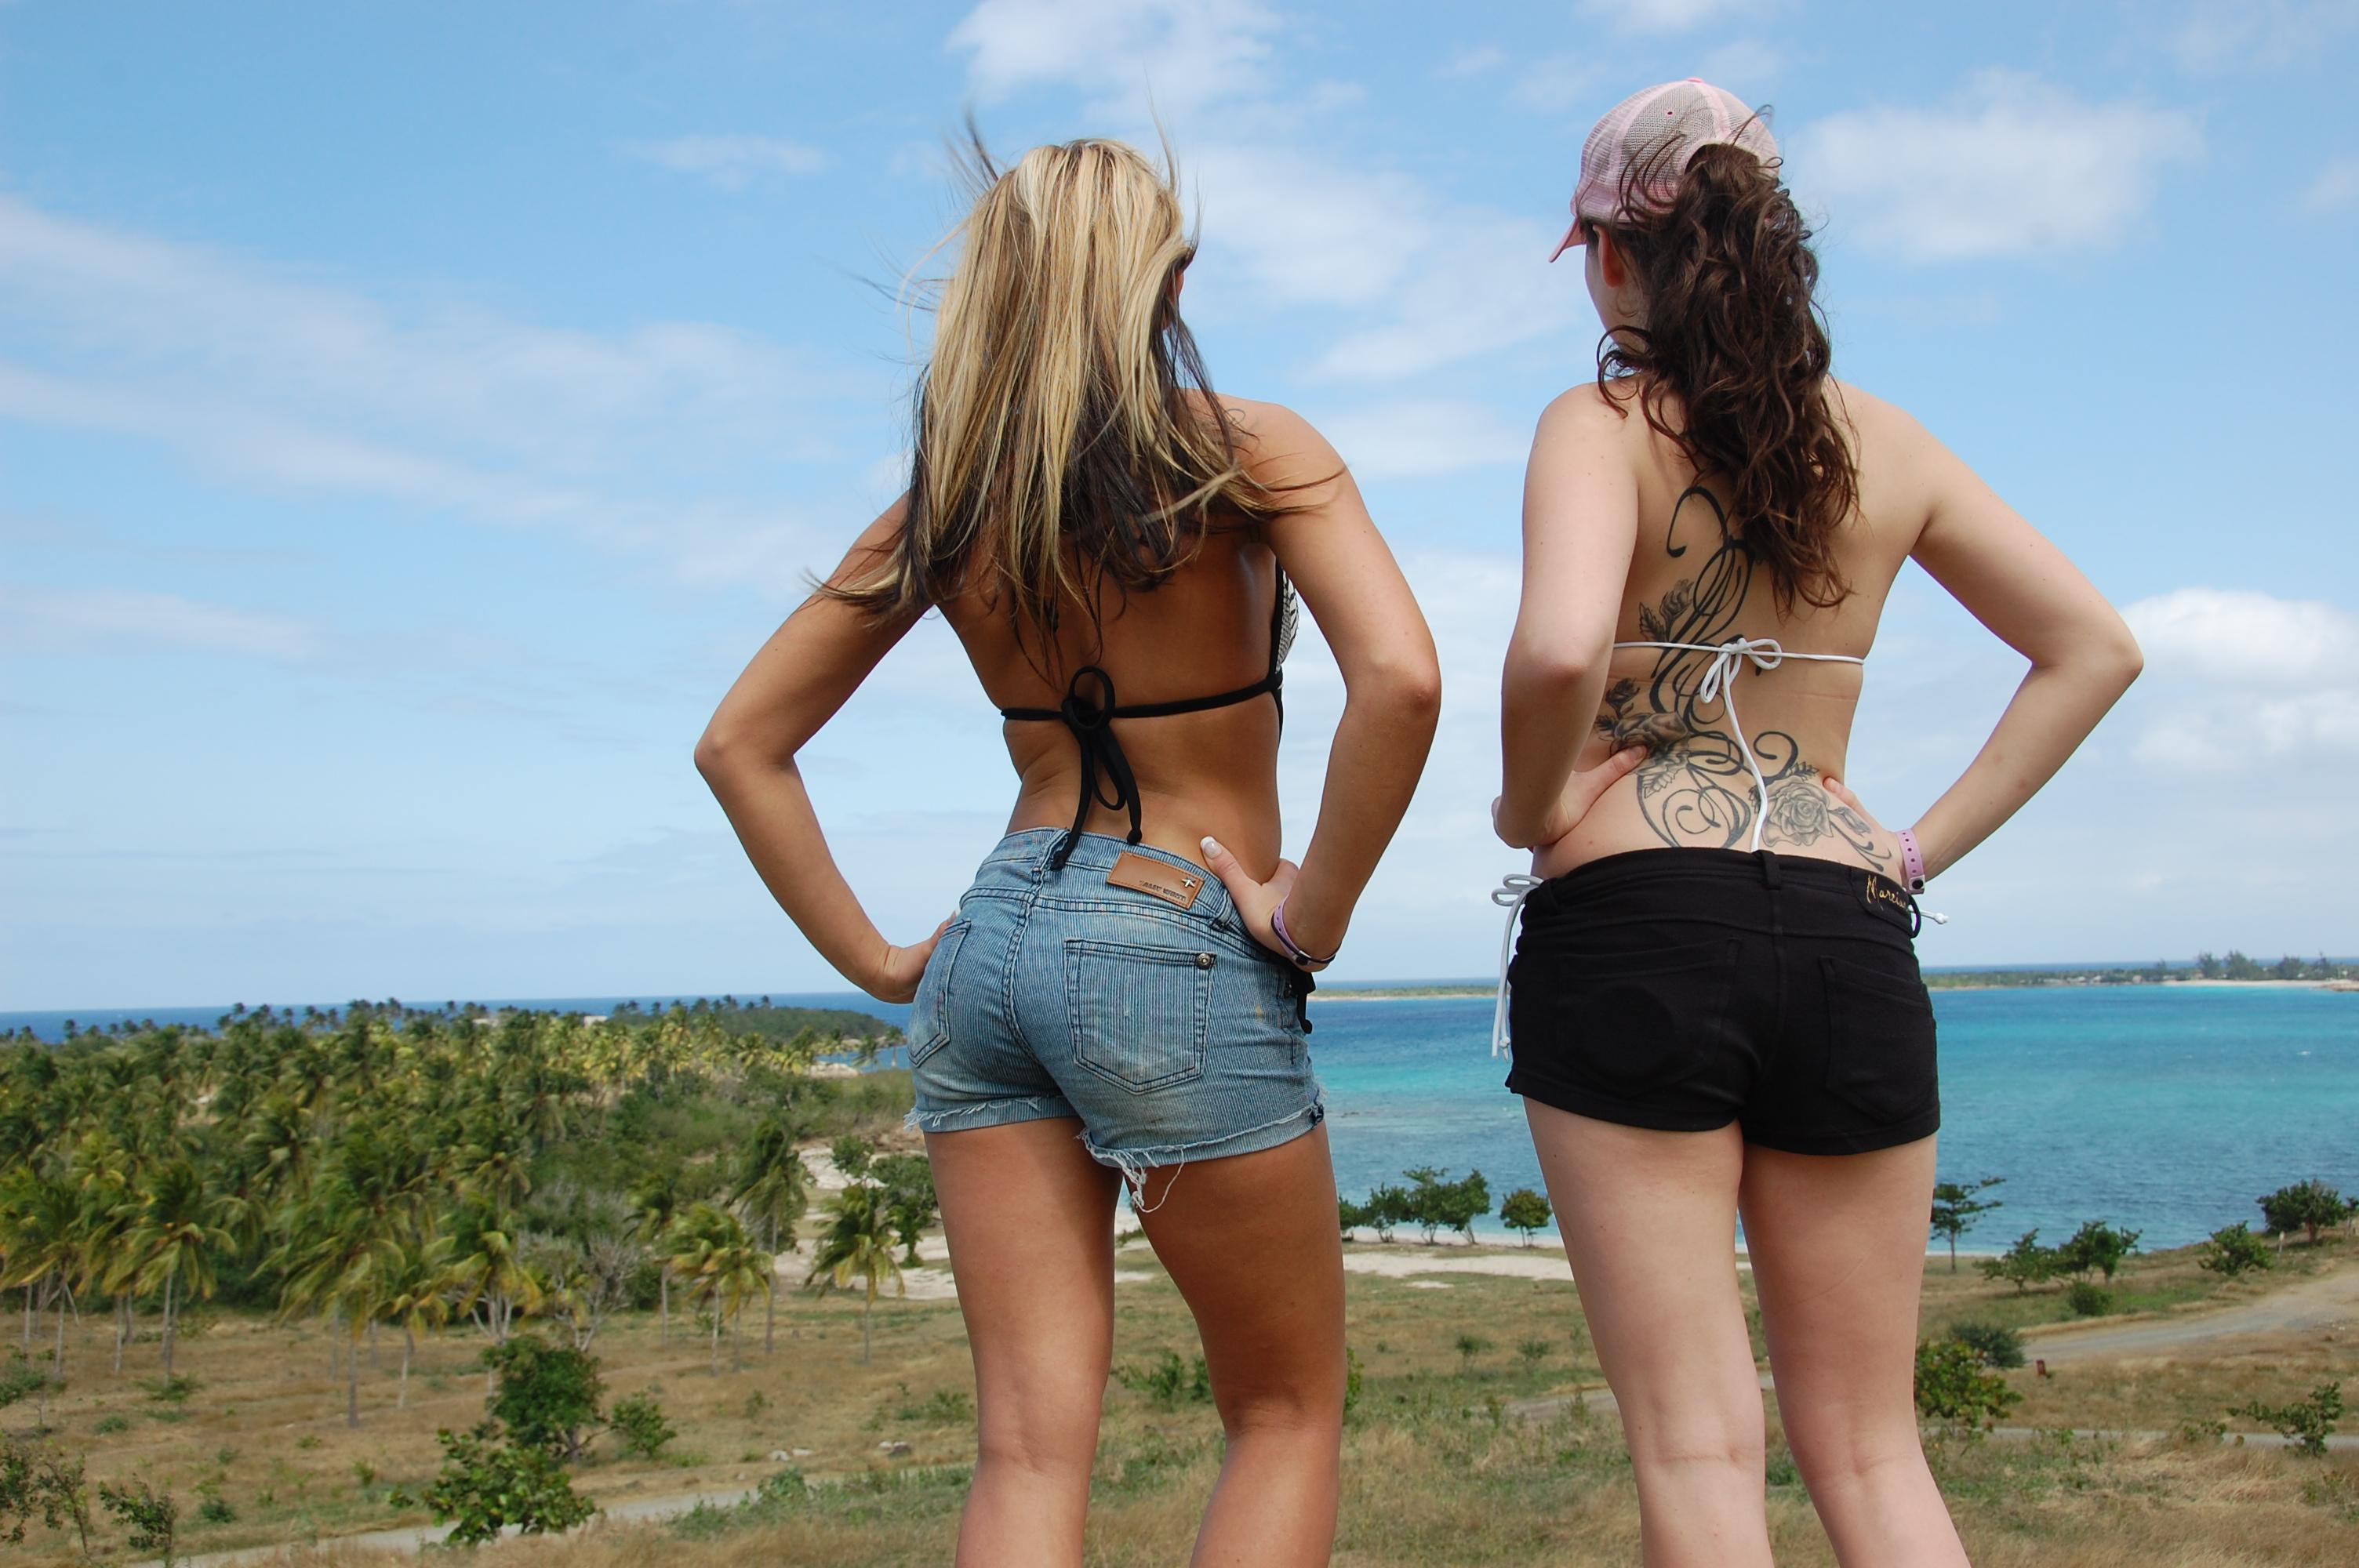 Cuba: Board of Tourism